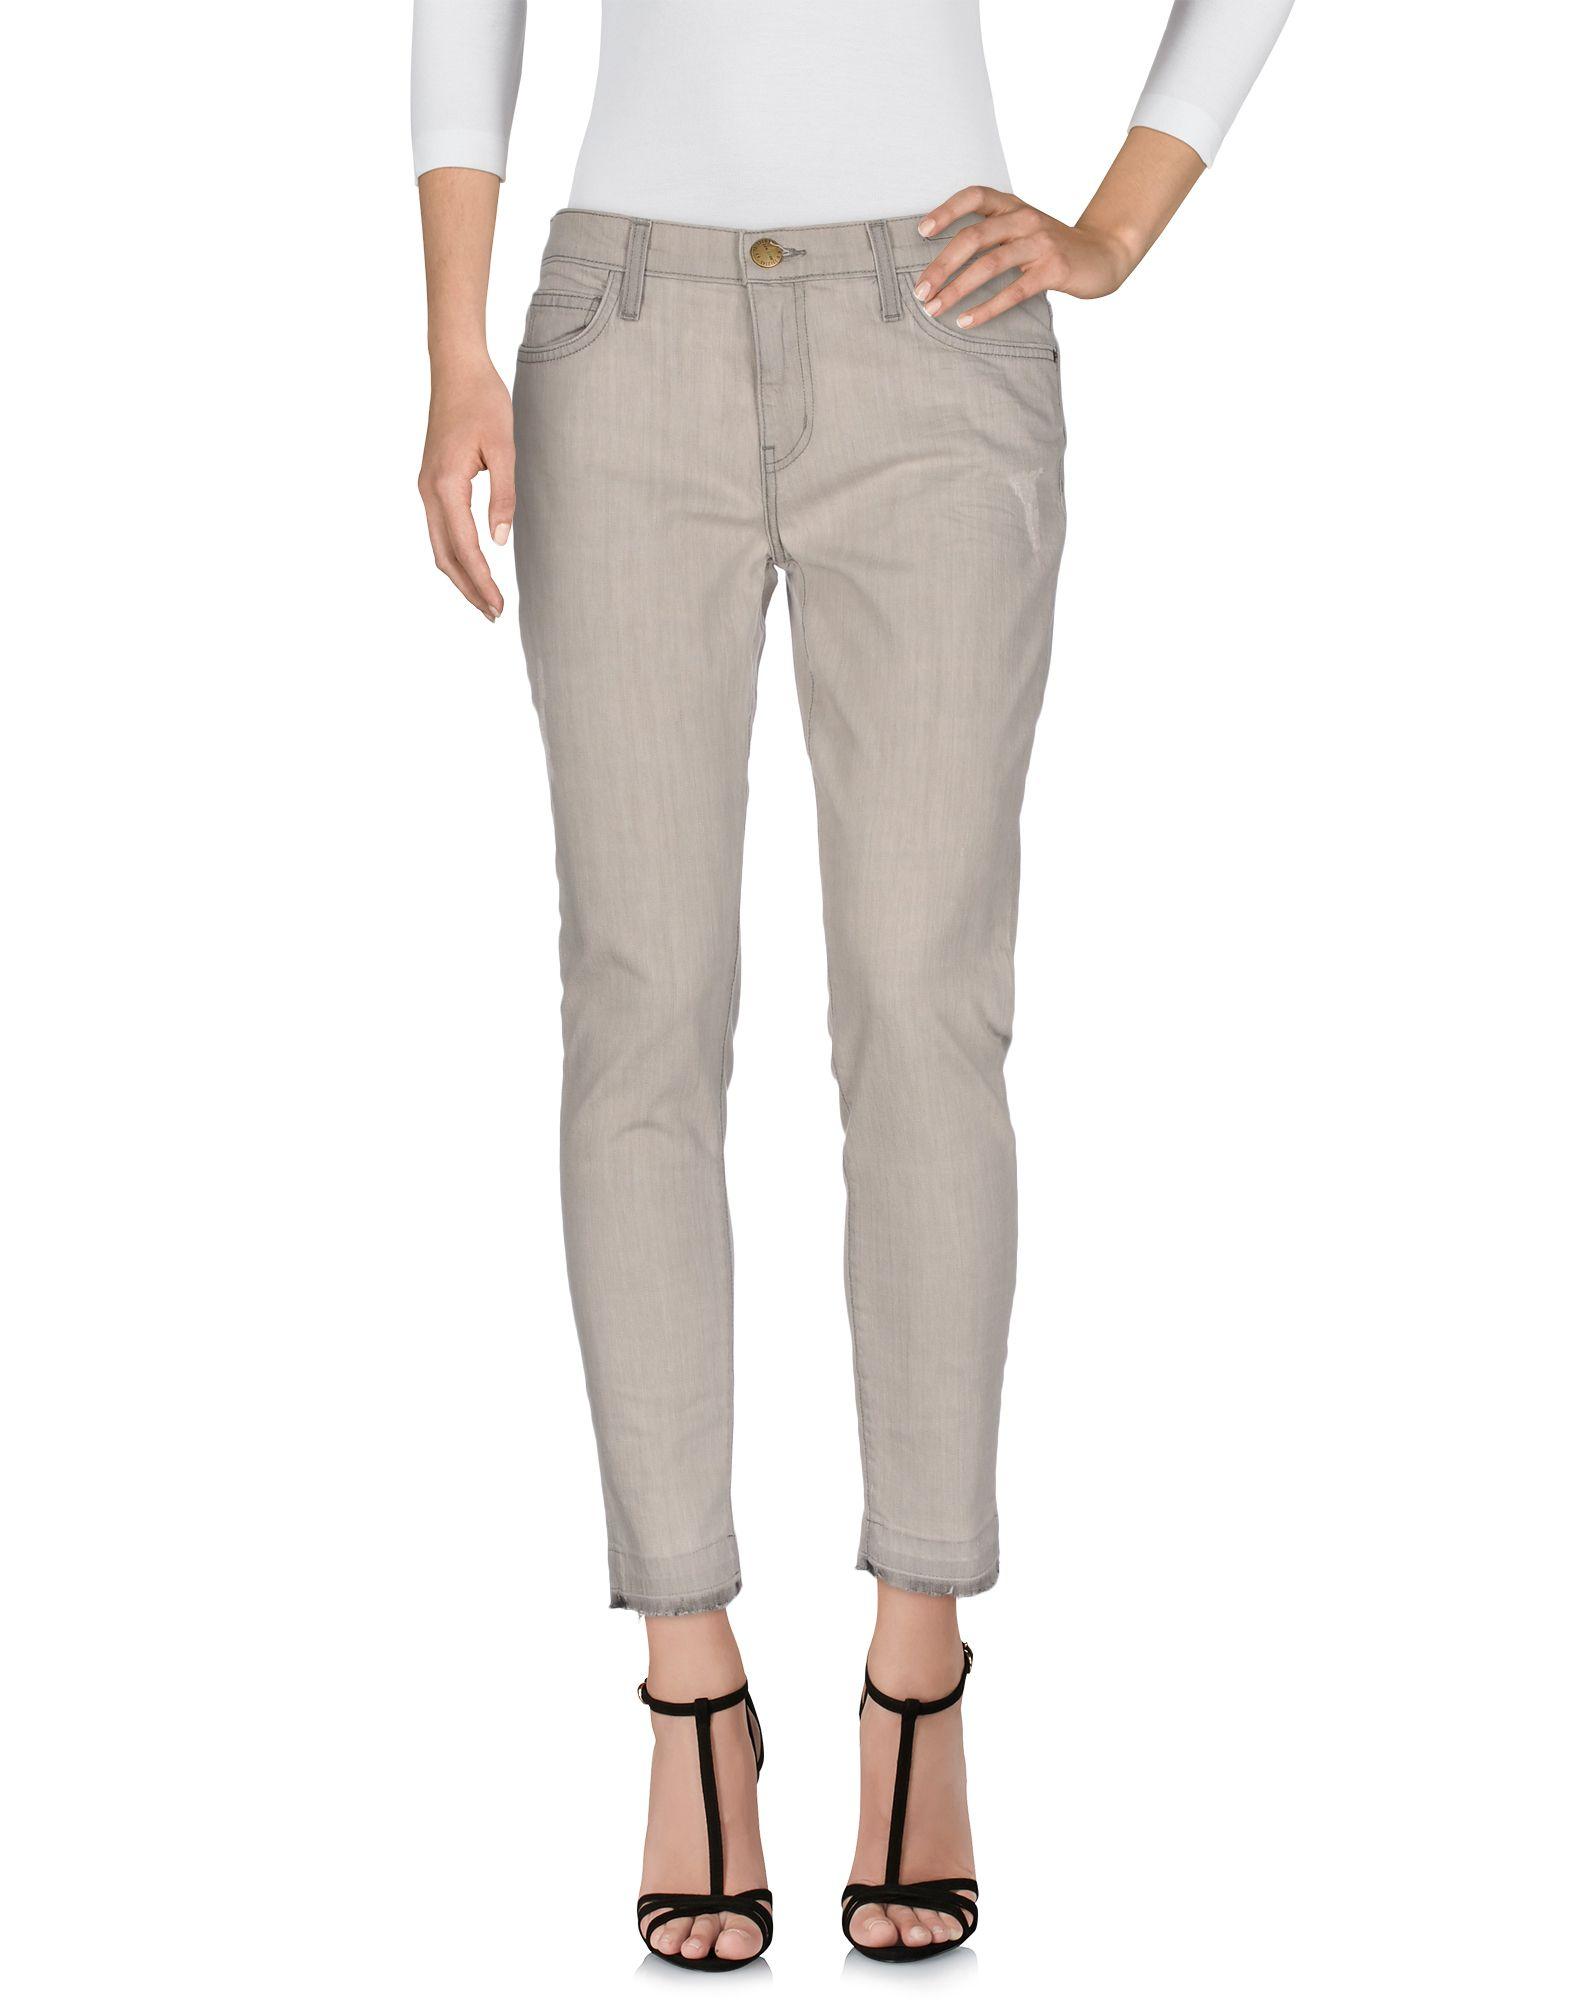 CURRENT/ELLIOTT Damen Jeanshose Farbe Grau Größe 7